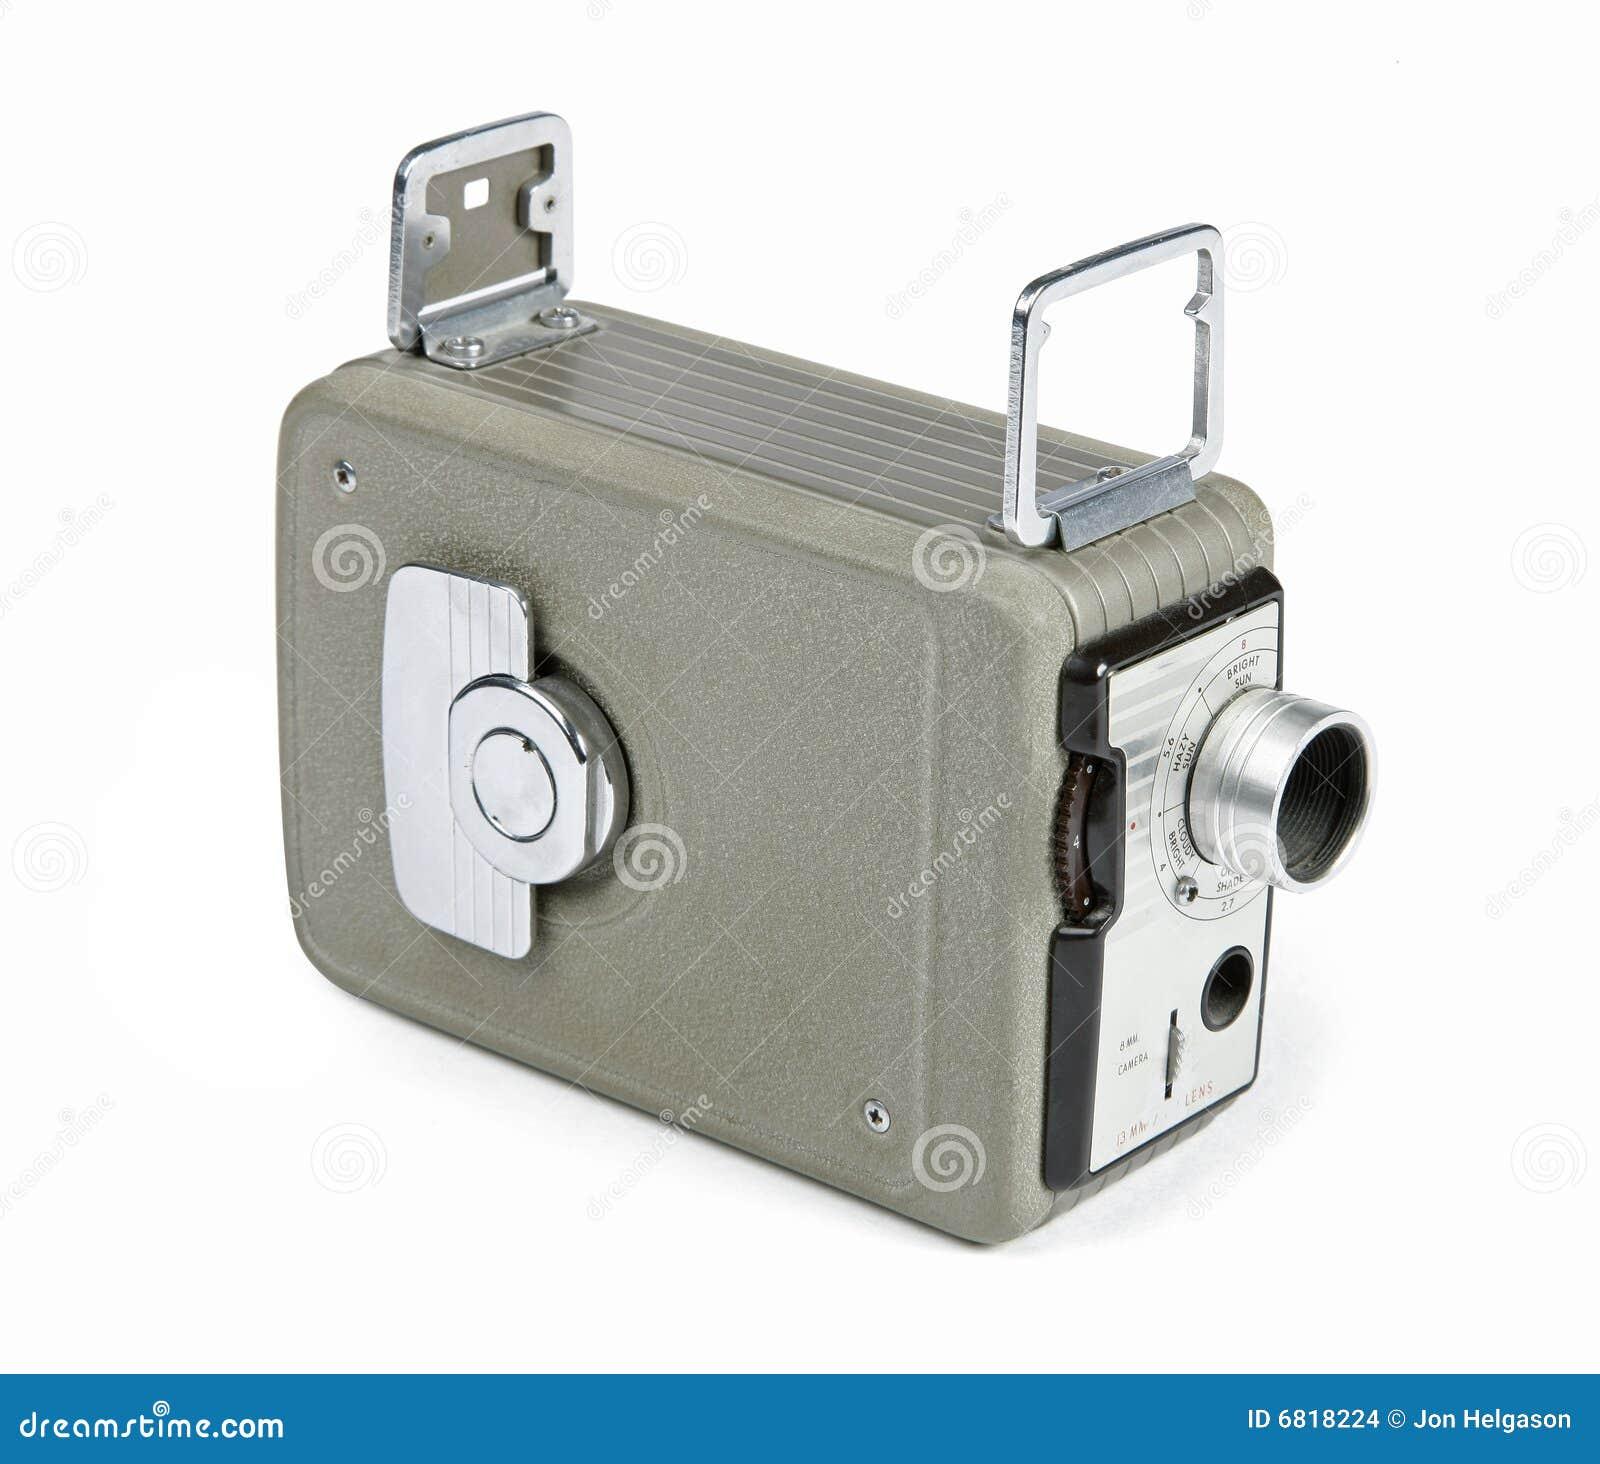 Retro 8mm camera